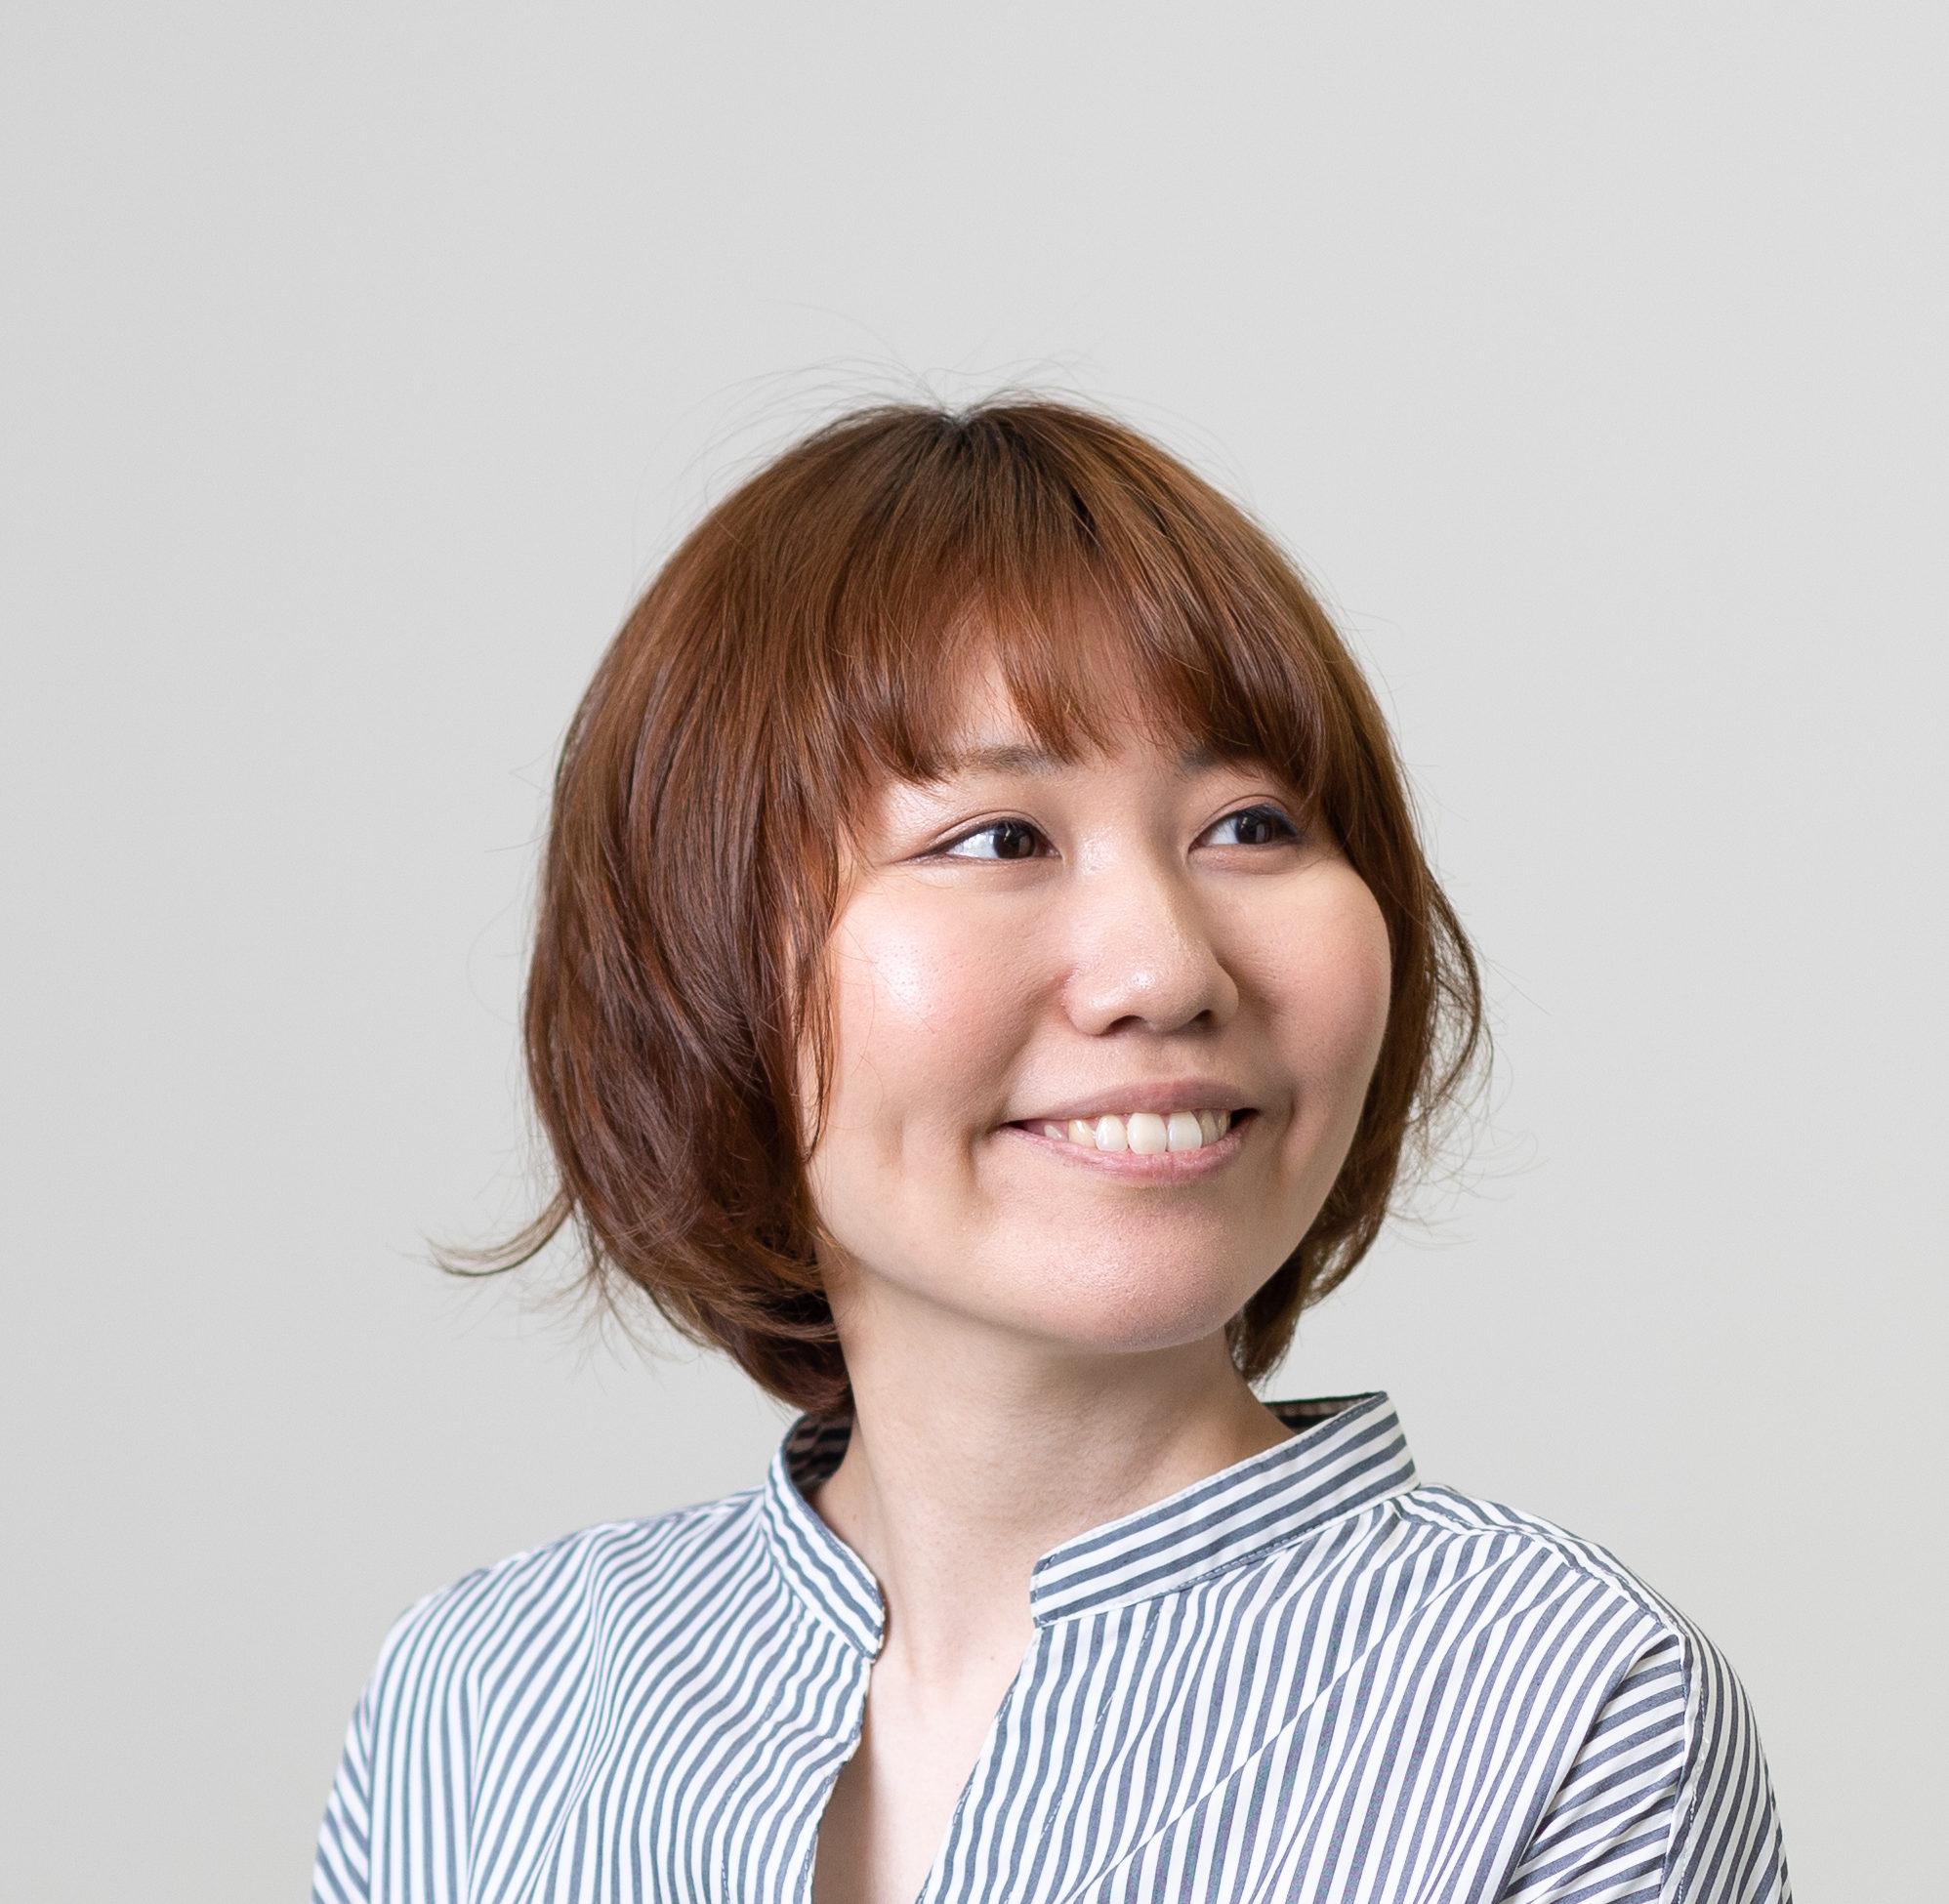 Minami.S